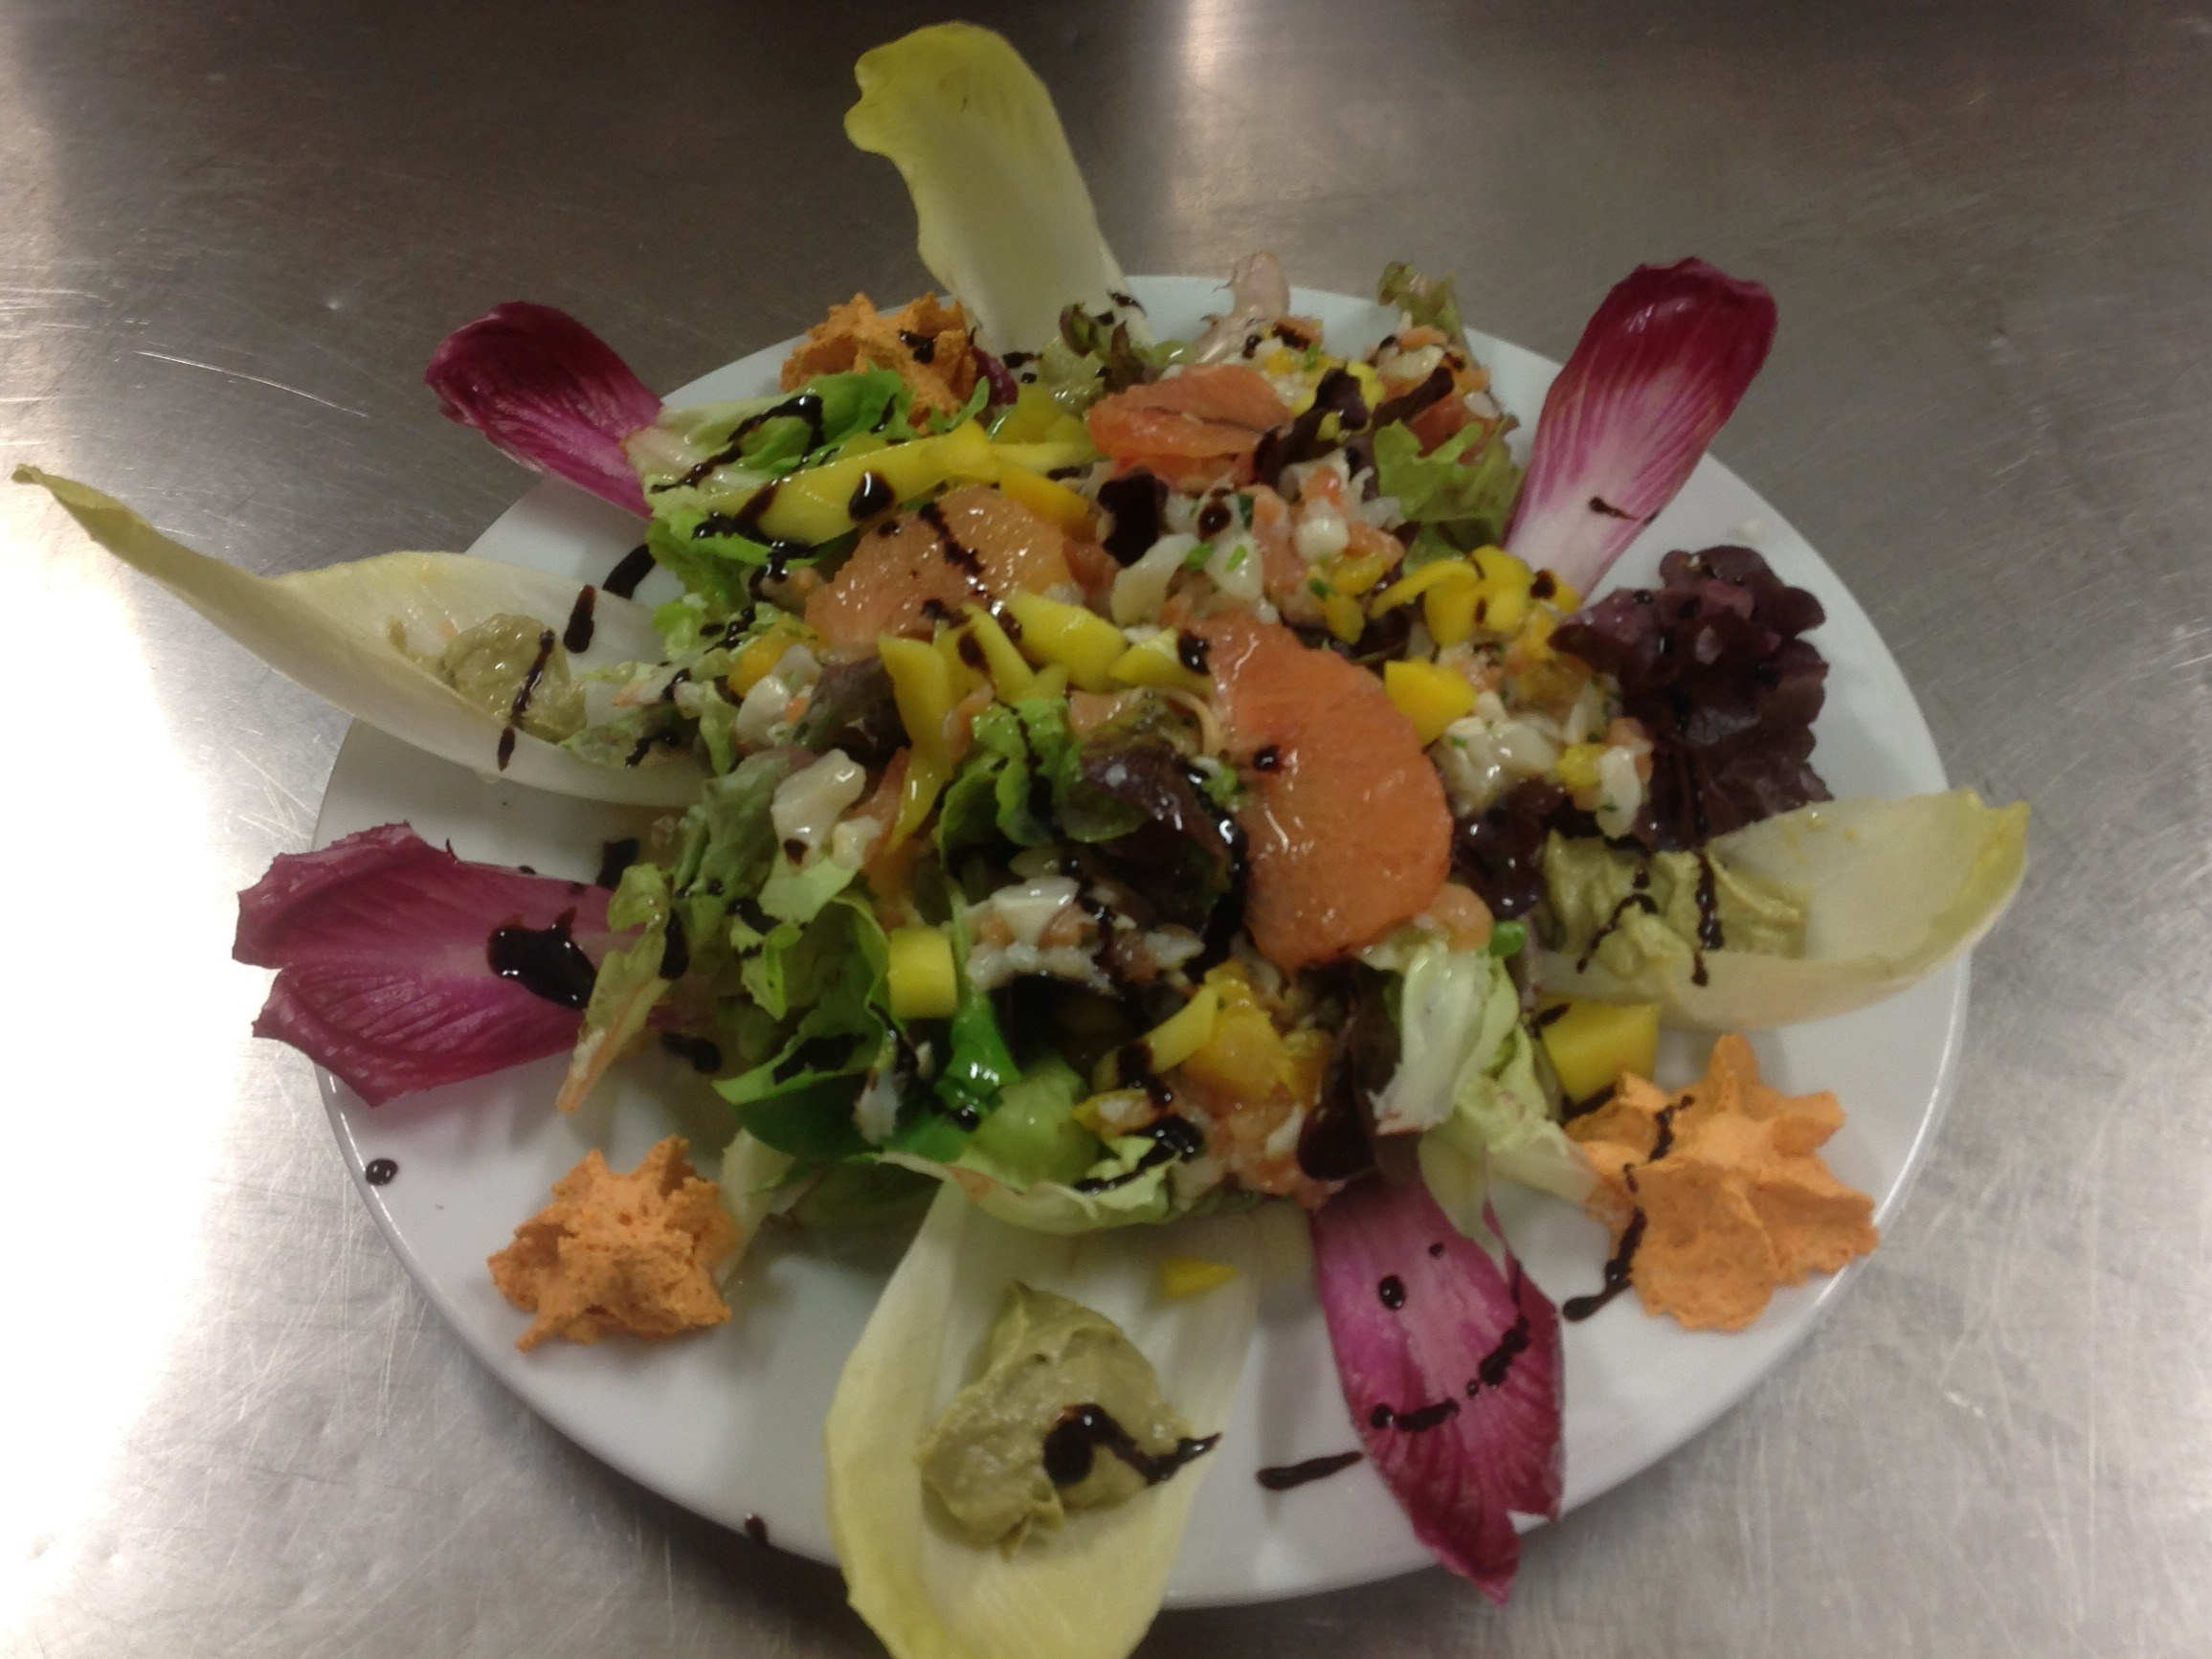 Salade fraicheur de l'auberge